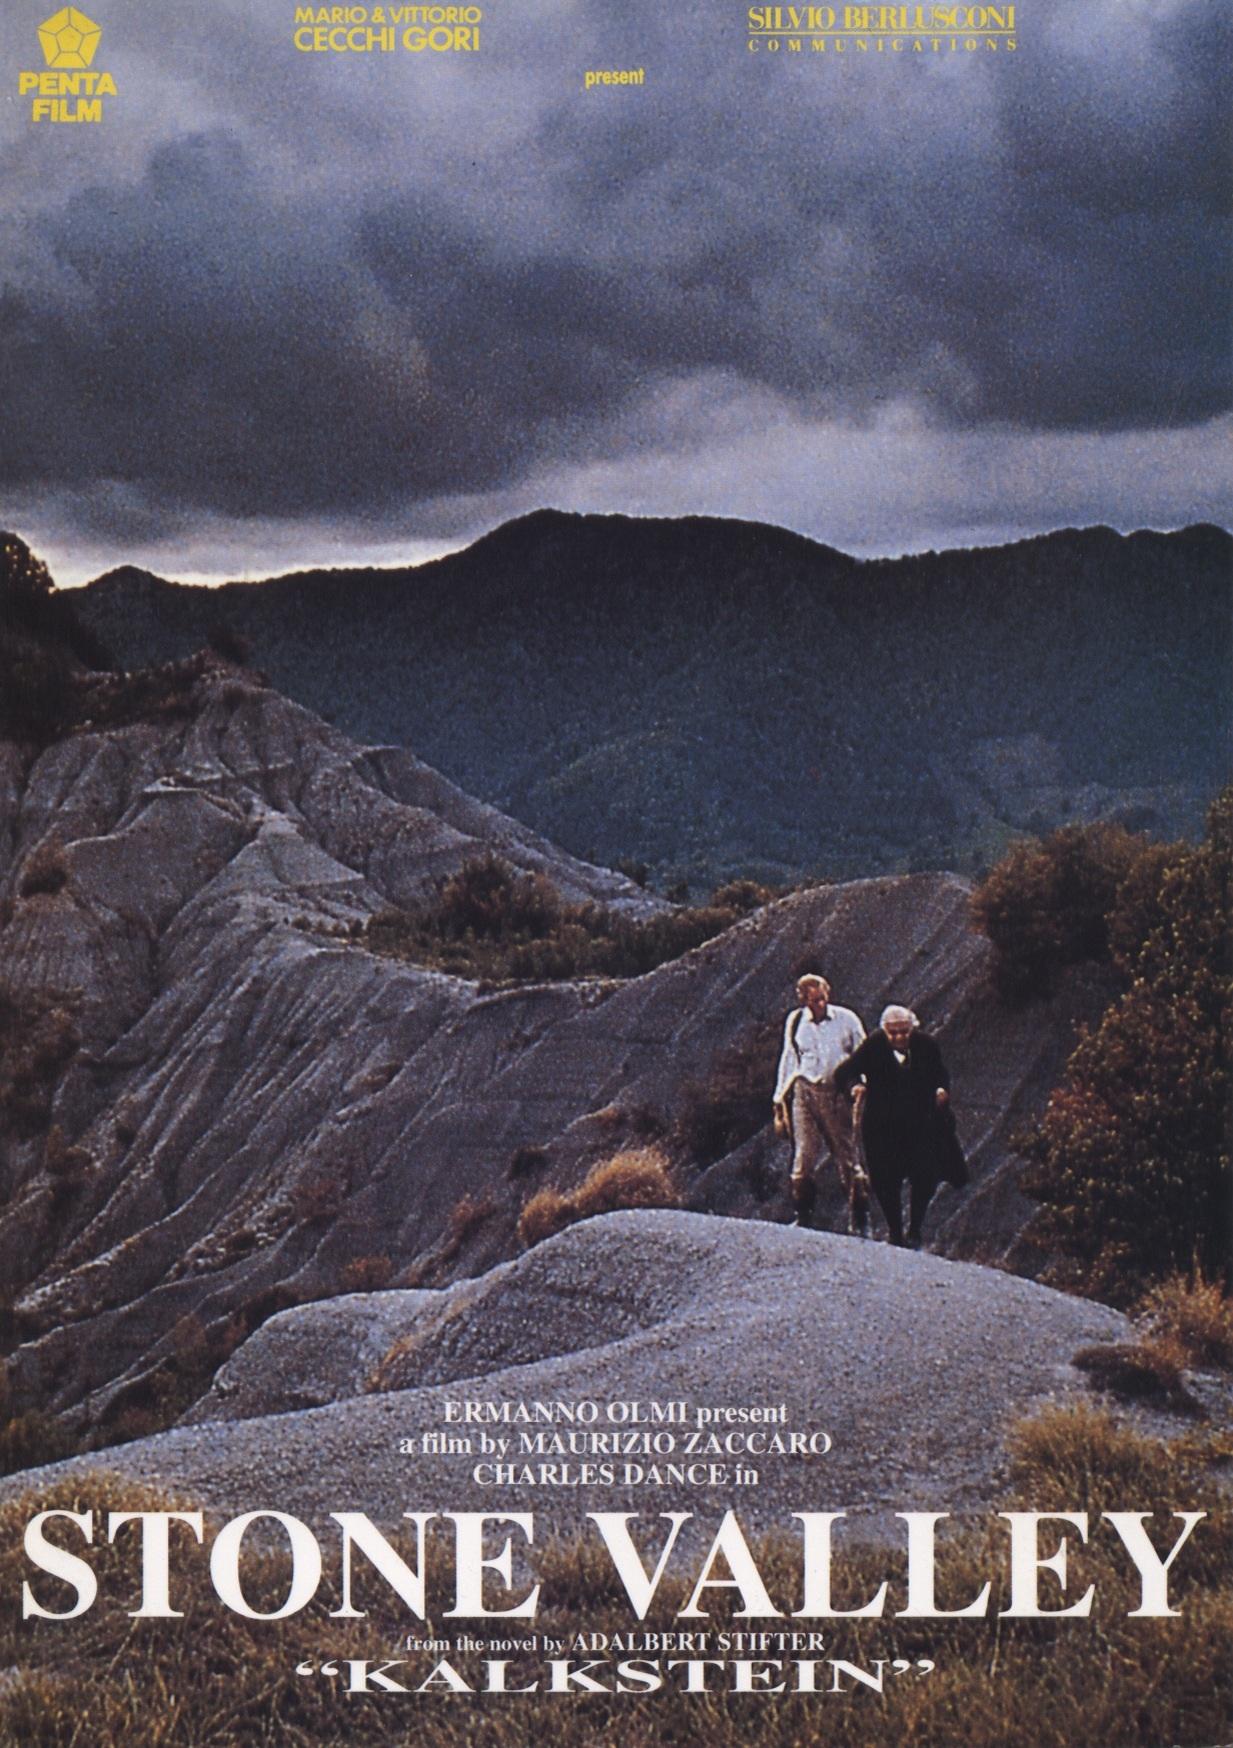 Kalk poster